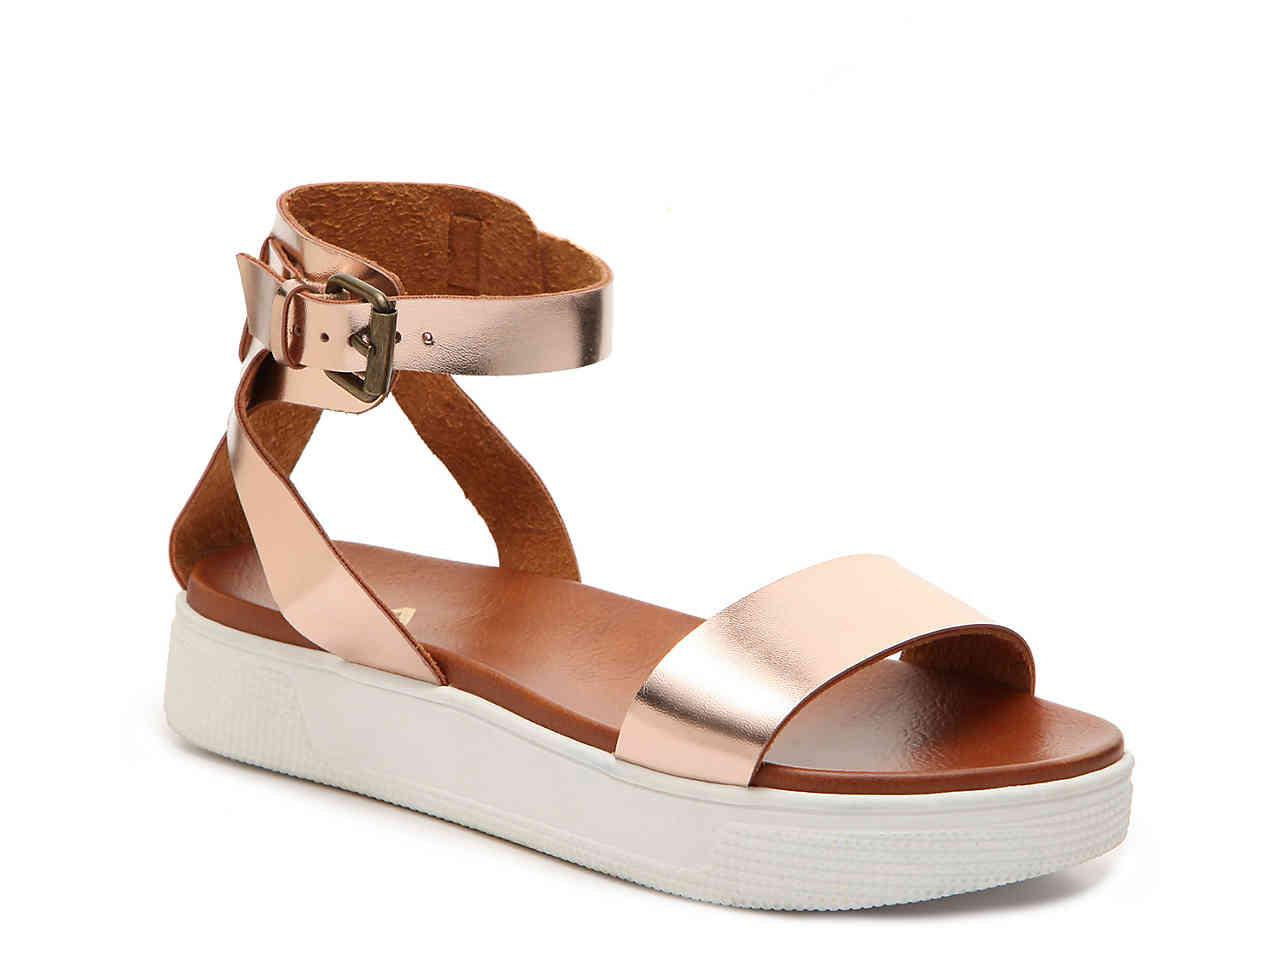 Mia Ellen Platform Sandal In Metallic Lyst